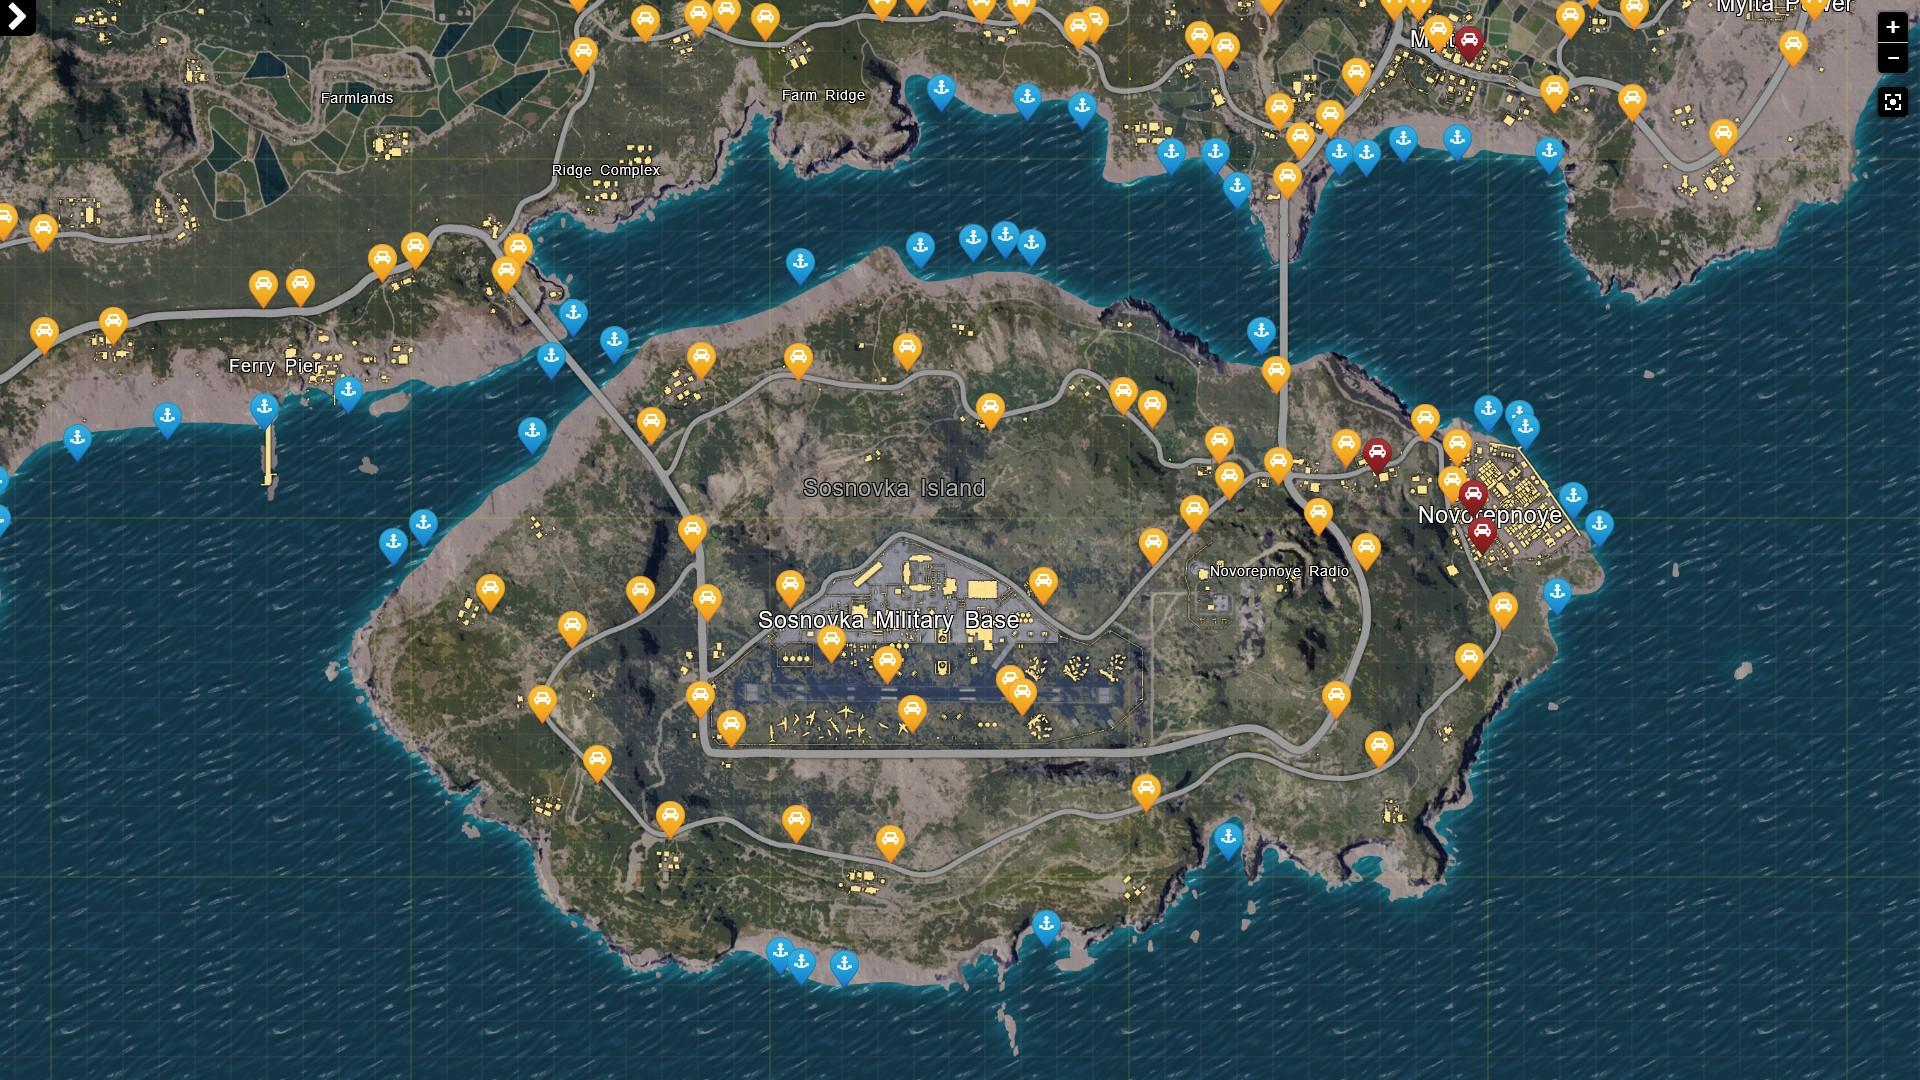 Playerunknown S Battlegrounds Maps Loot Maps Pictures: Steam Community :: Guide :: PuBG Erangel/Miramar Maps With